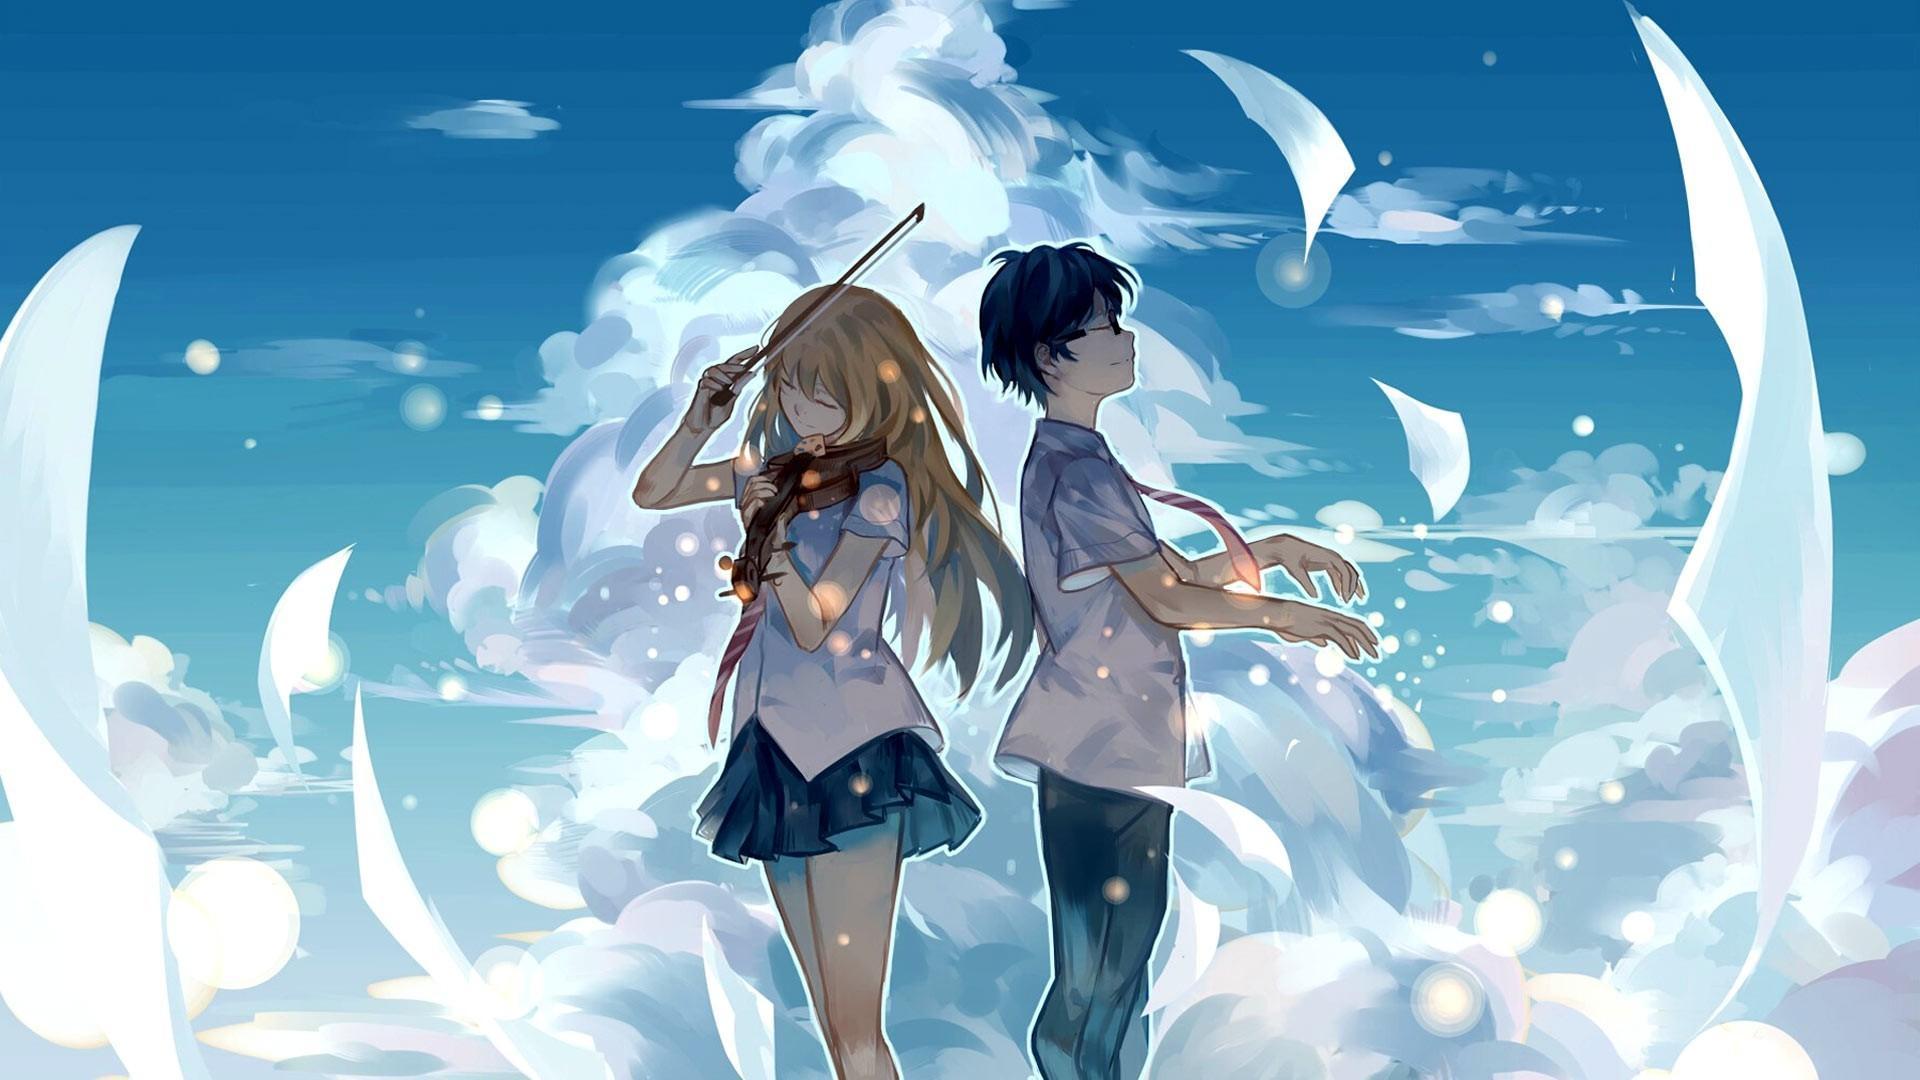 Anime Love Wallpaper Hd 3d gambar ke 3